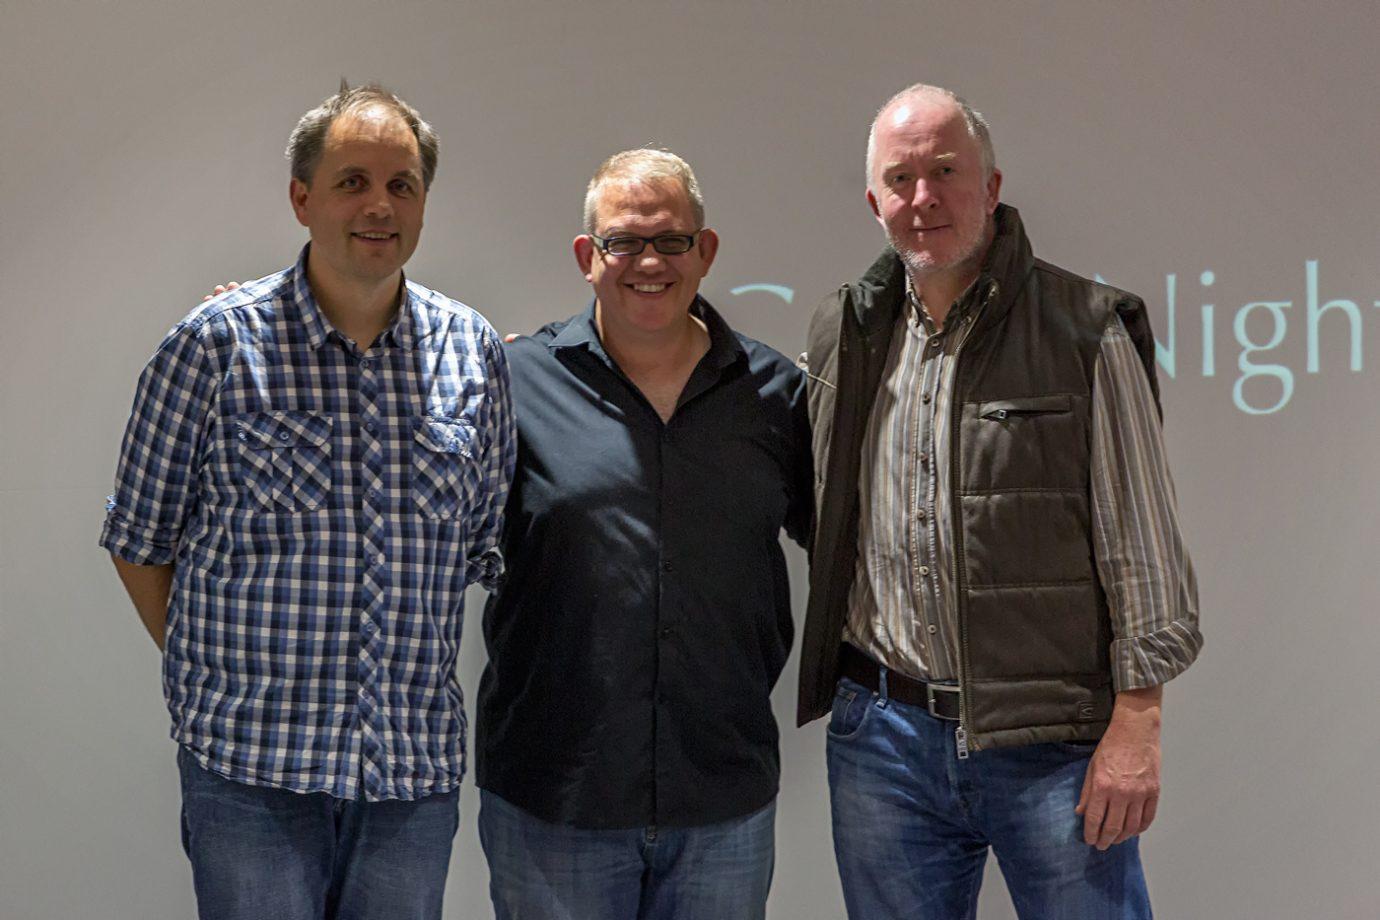 Big Speaker Event with David Clapp, Mark Littlejohn and Melvin Nicholson